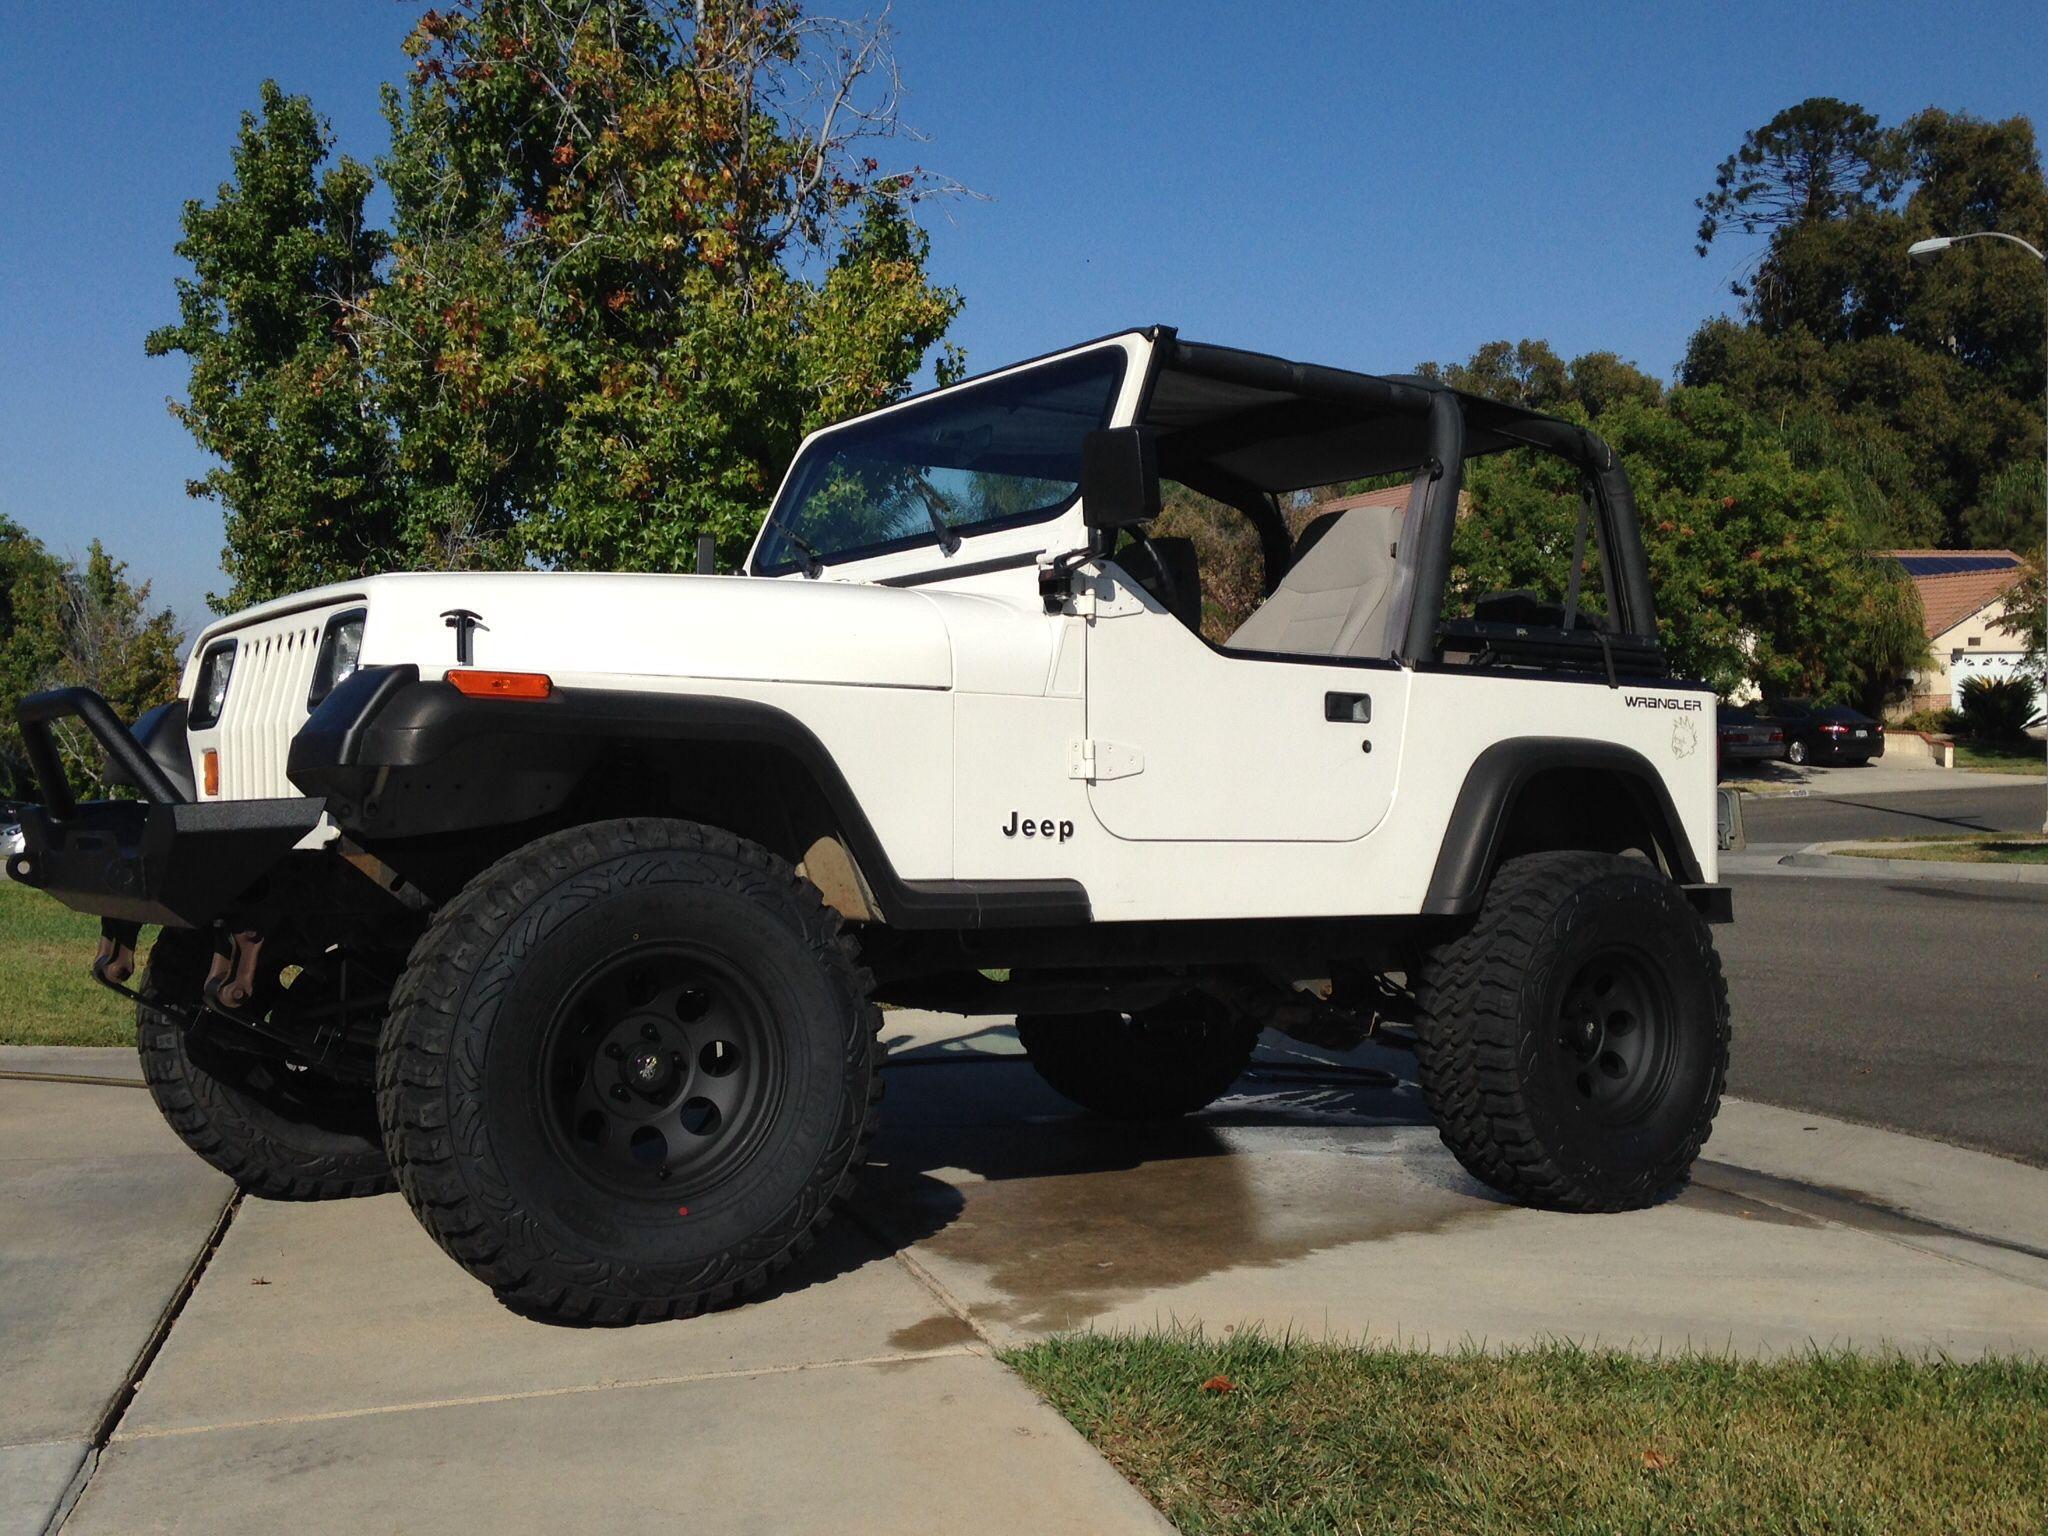 1995 Jeep Wrangler Yj Jeep Wrangler Yj Jeep Yj Jeep Wrangler